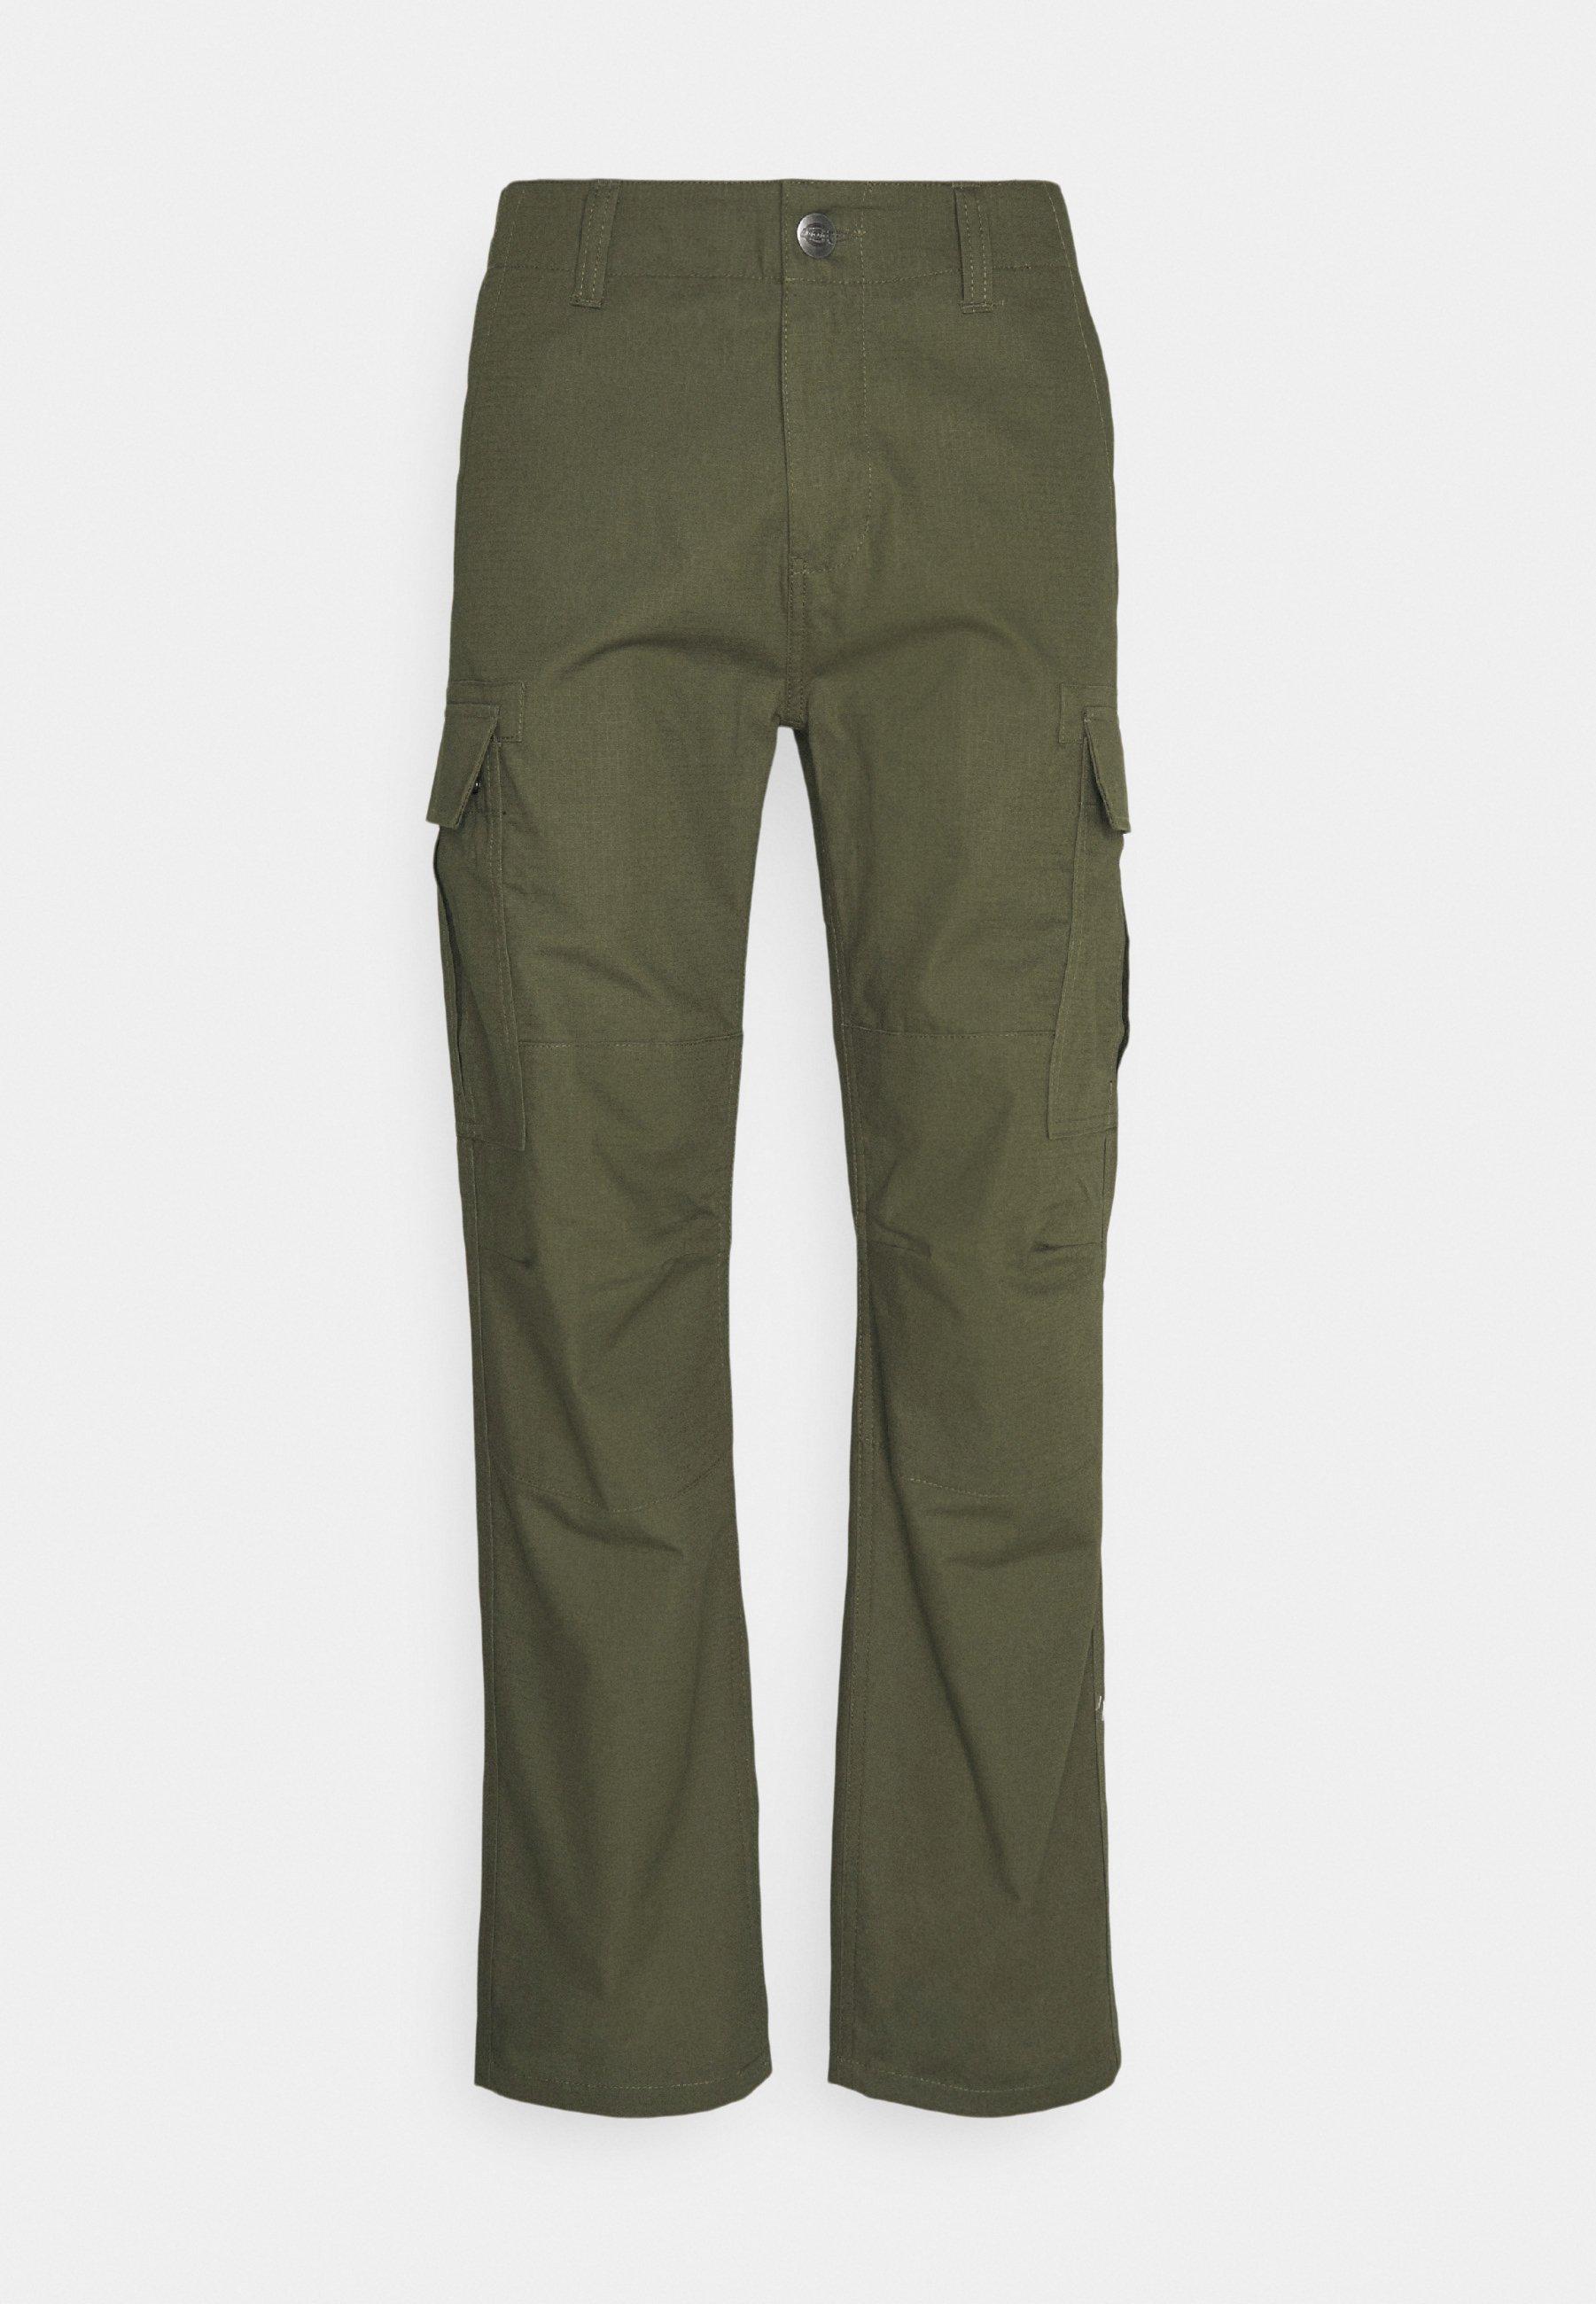 Homme MILLERVILLE - Pantalon cargo